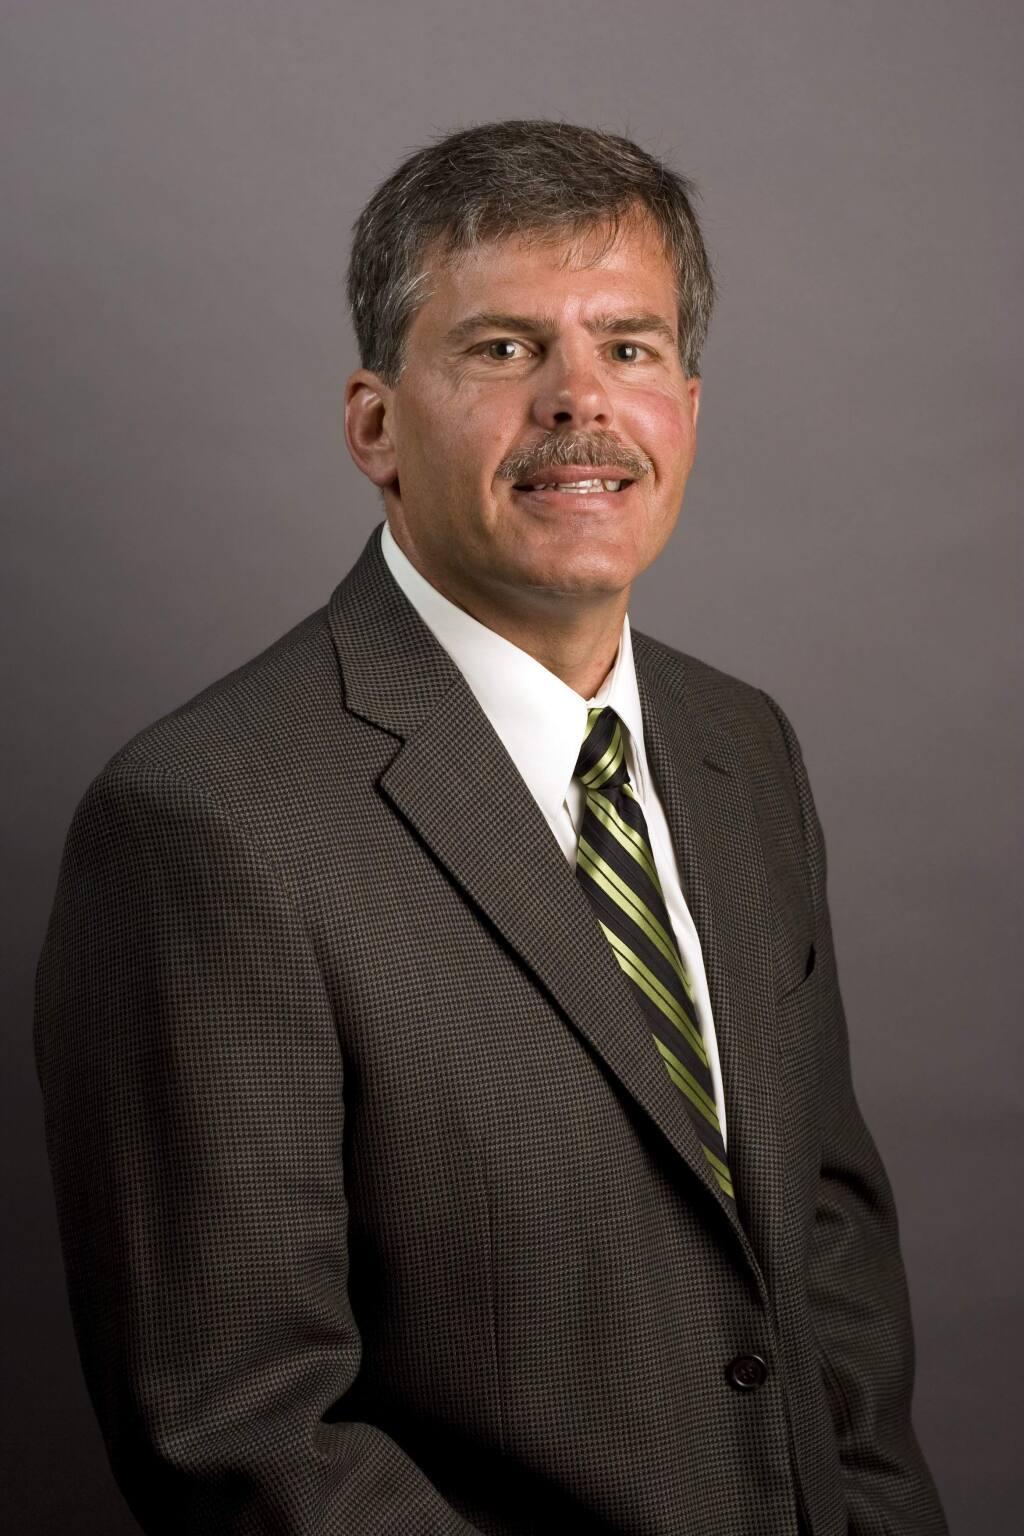 Shawn Johnson, managing partner, Keegan & Coppin Co., Inc./ONCOR International